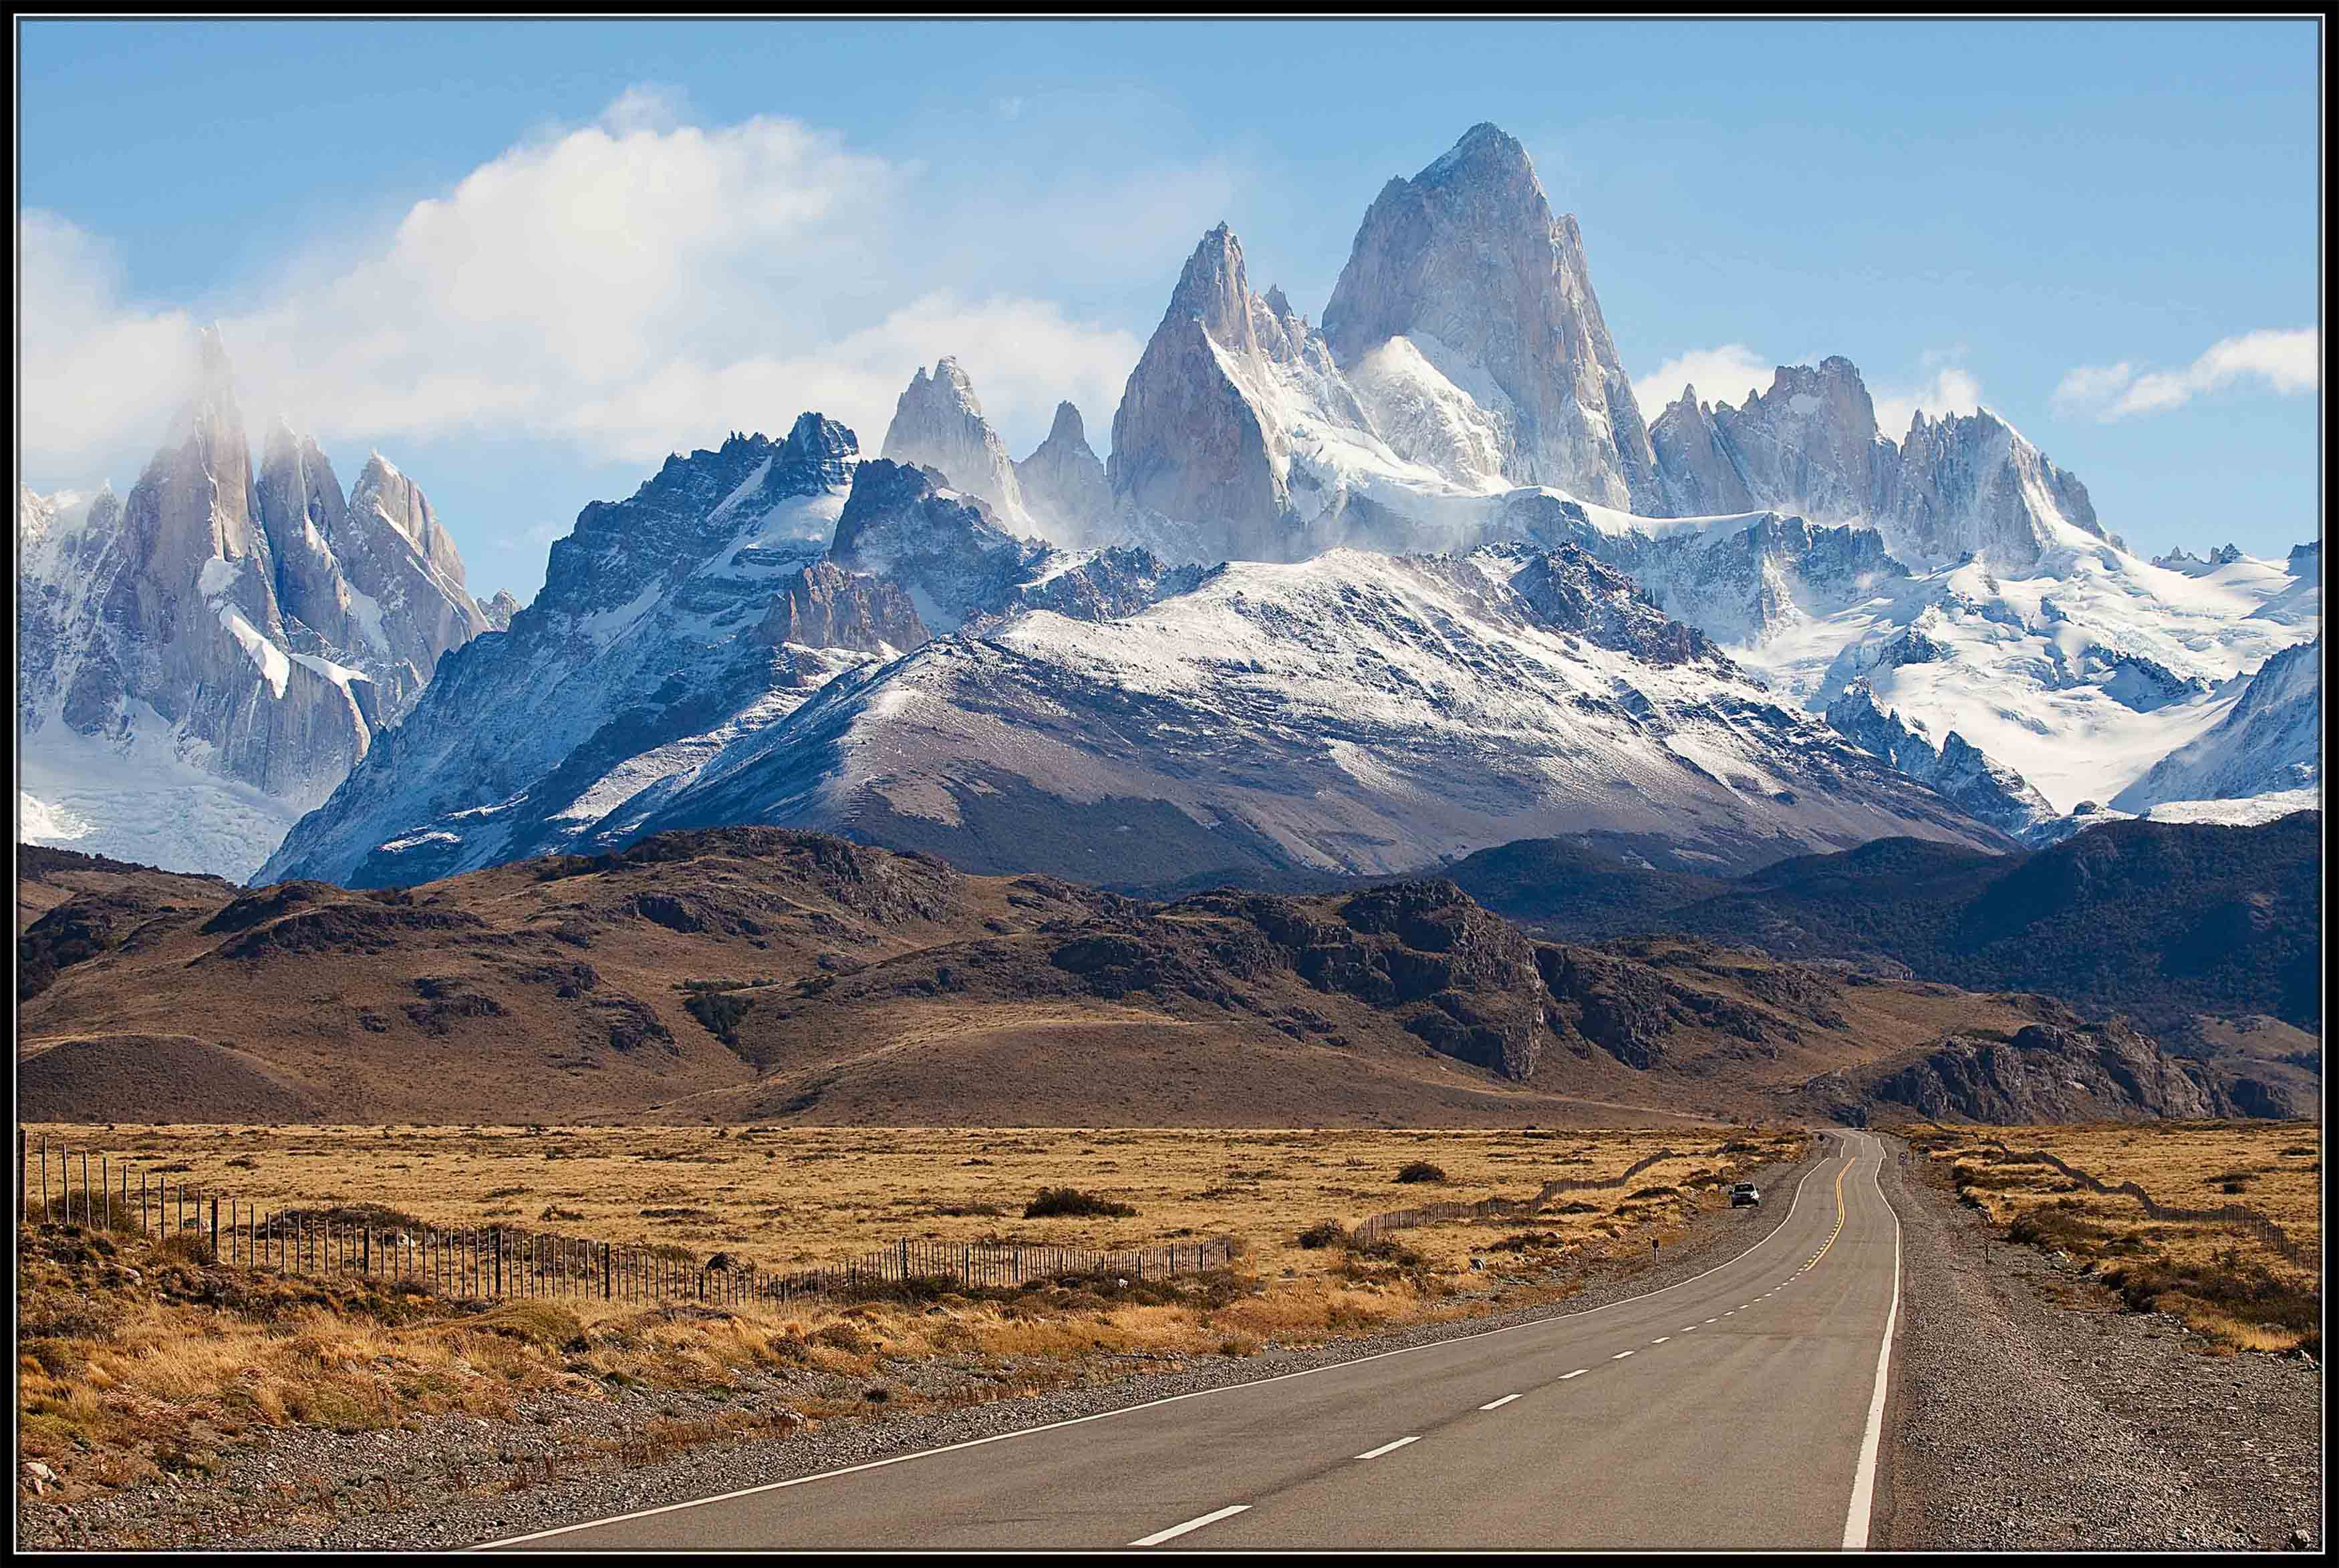 patagonia - photo #4